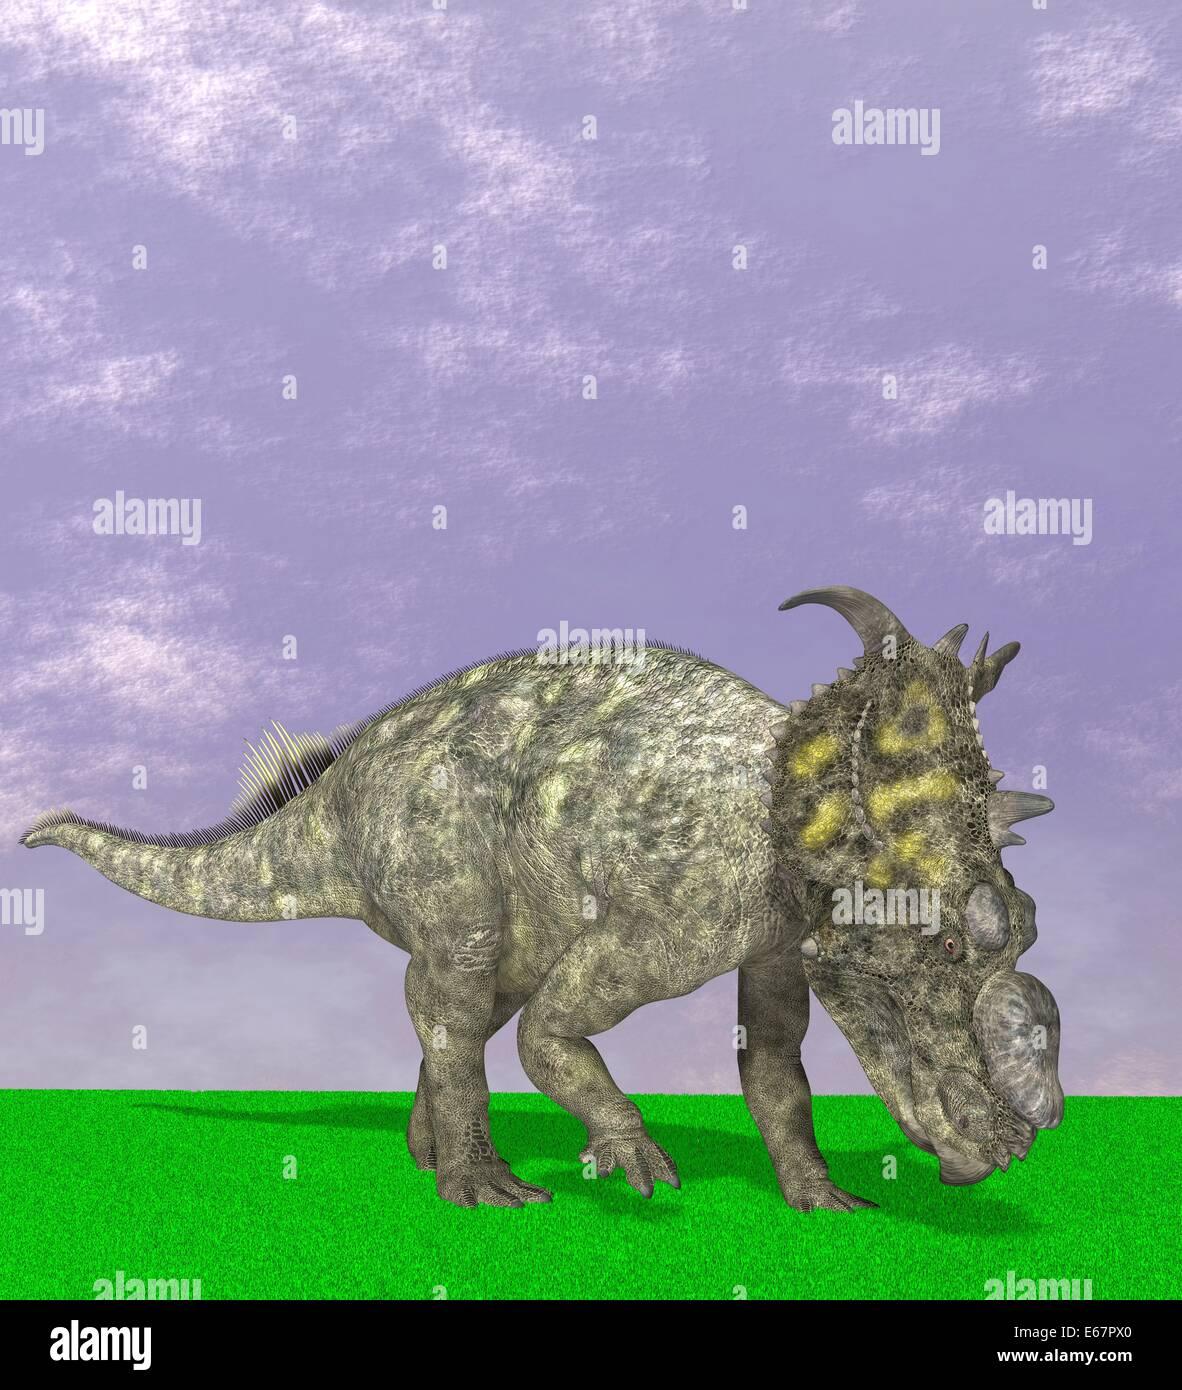 Dinosaurier Pachyrhinosaurus / Pachyrhinosaurus dinosauro Foto Stock